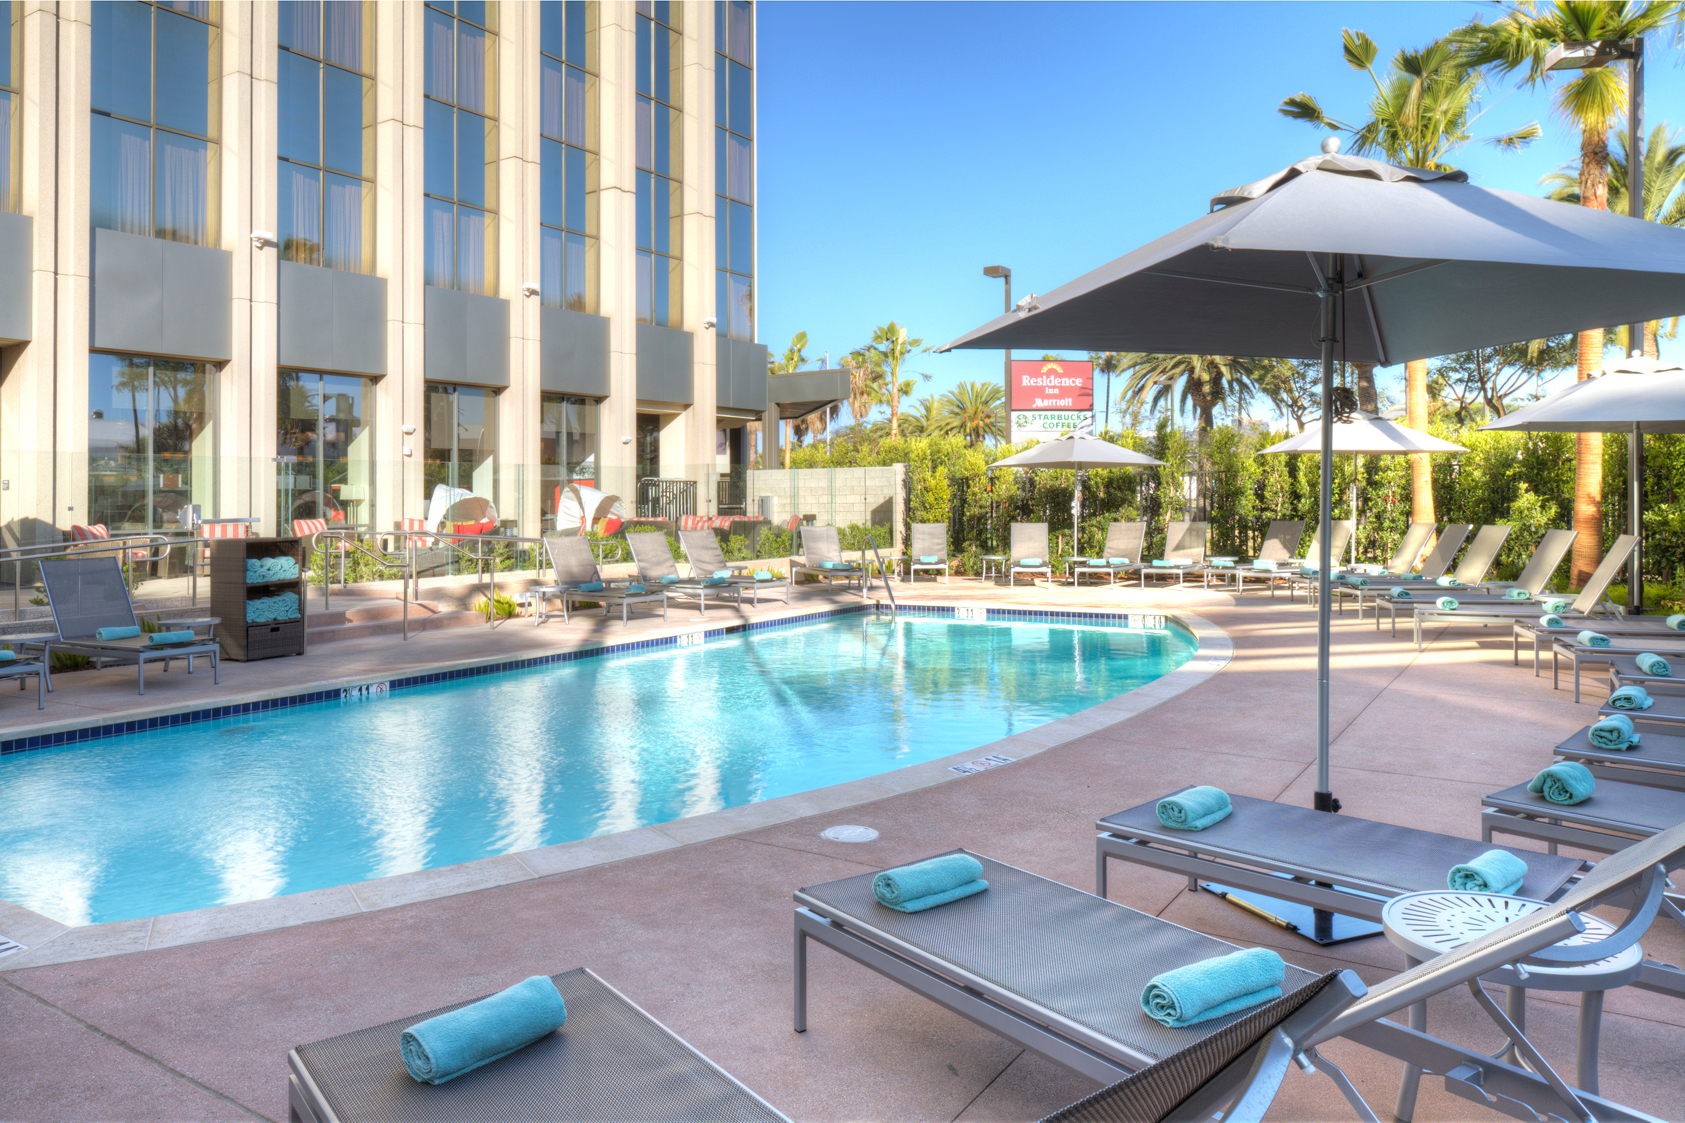 Residence Inn by Marriott Los Angeles LAX/Century Boulevard image 26